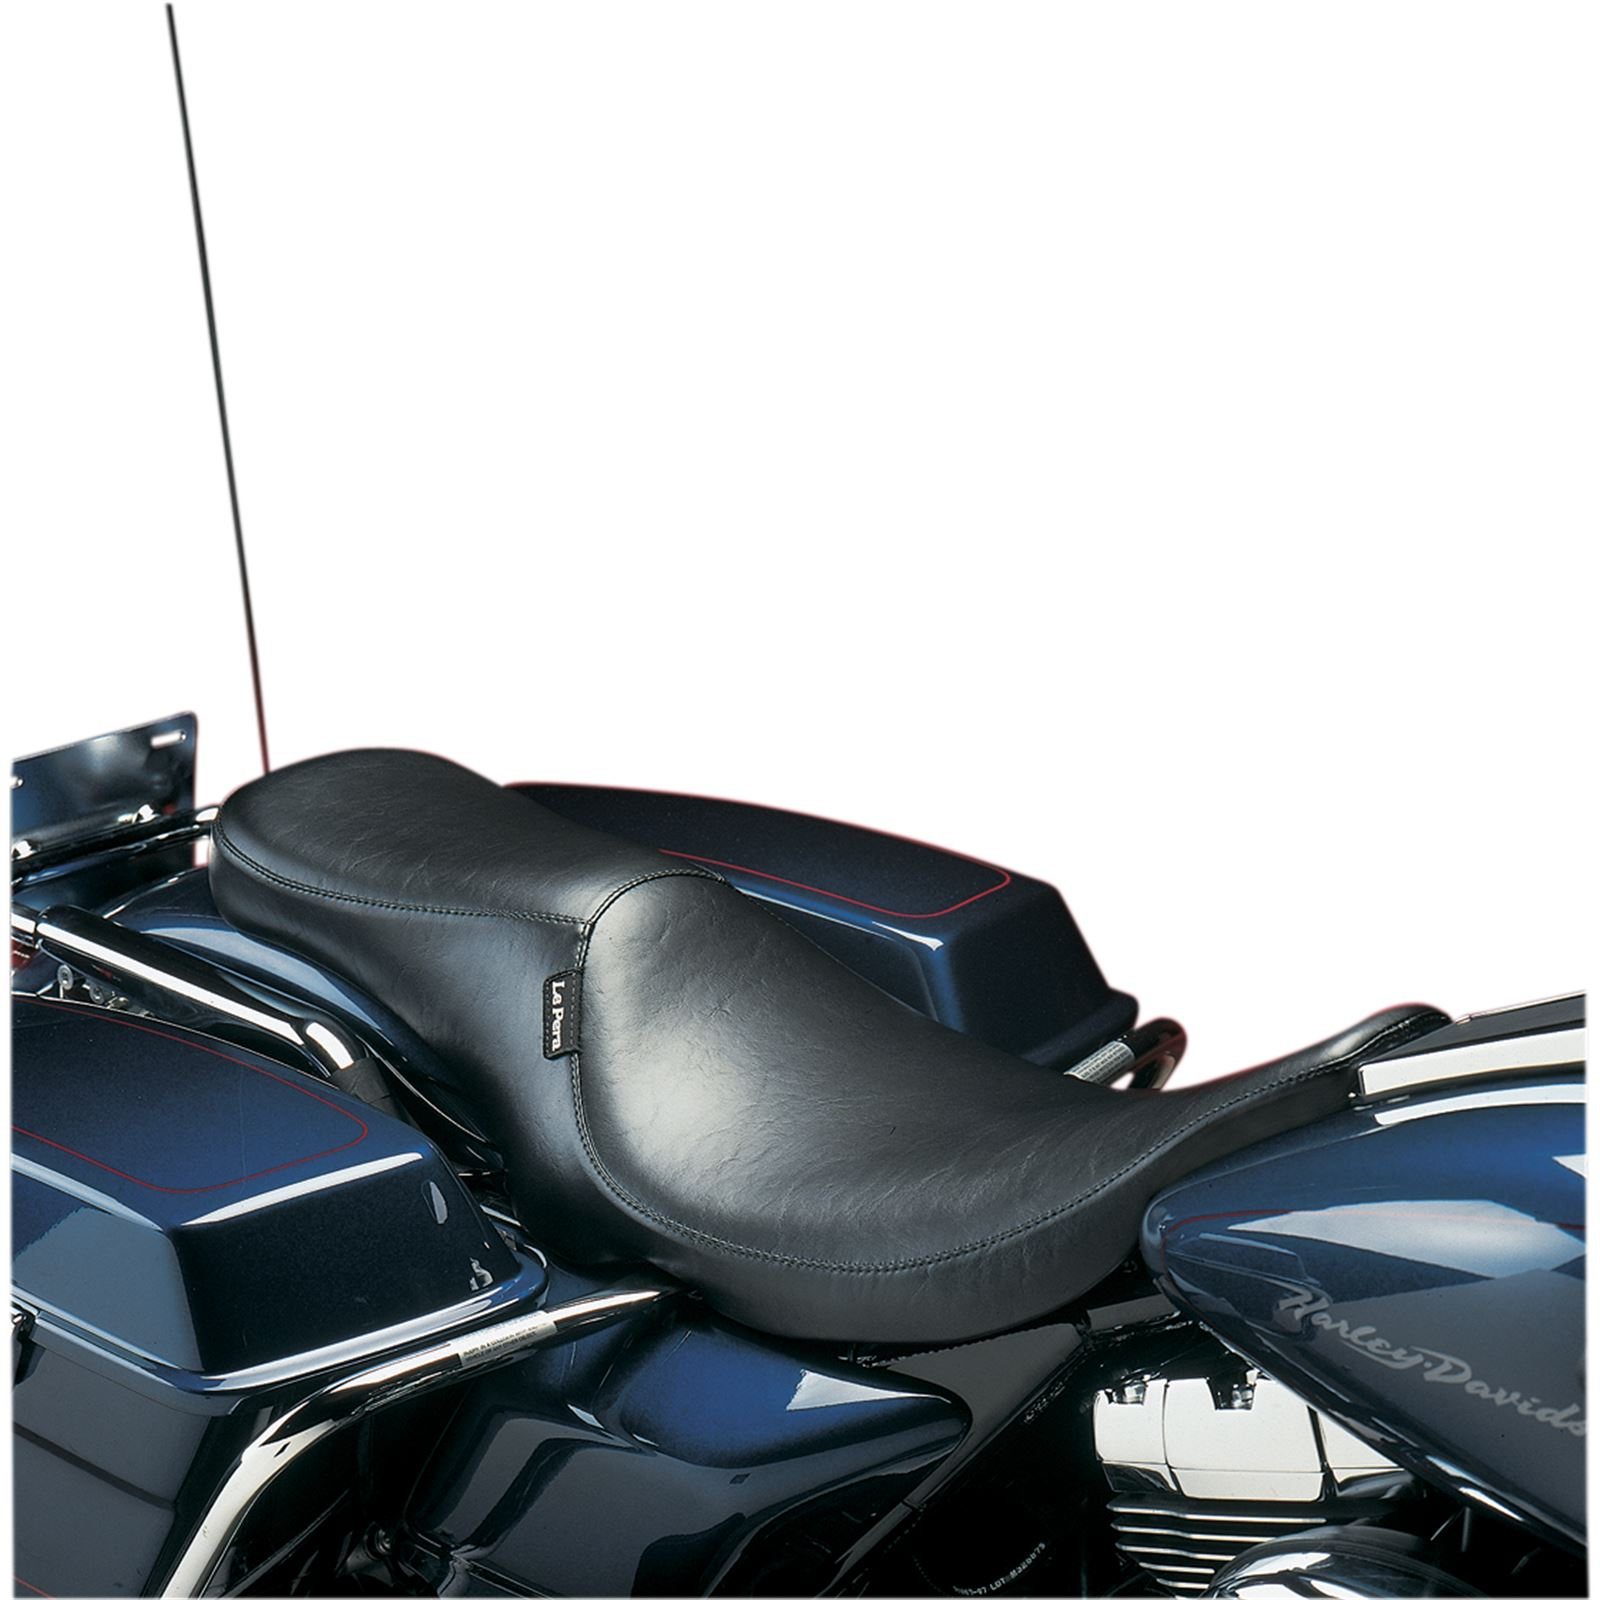 Le Pera Silhouette 2-Up Seat - FLT '97-'01